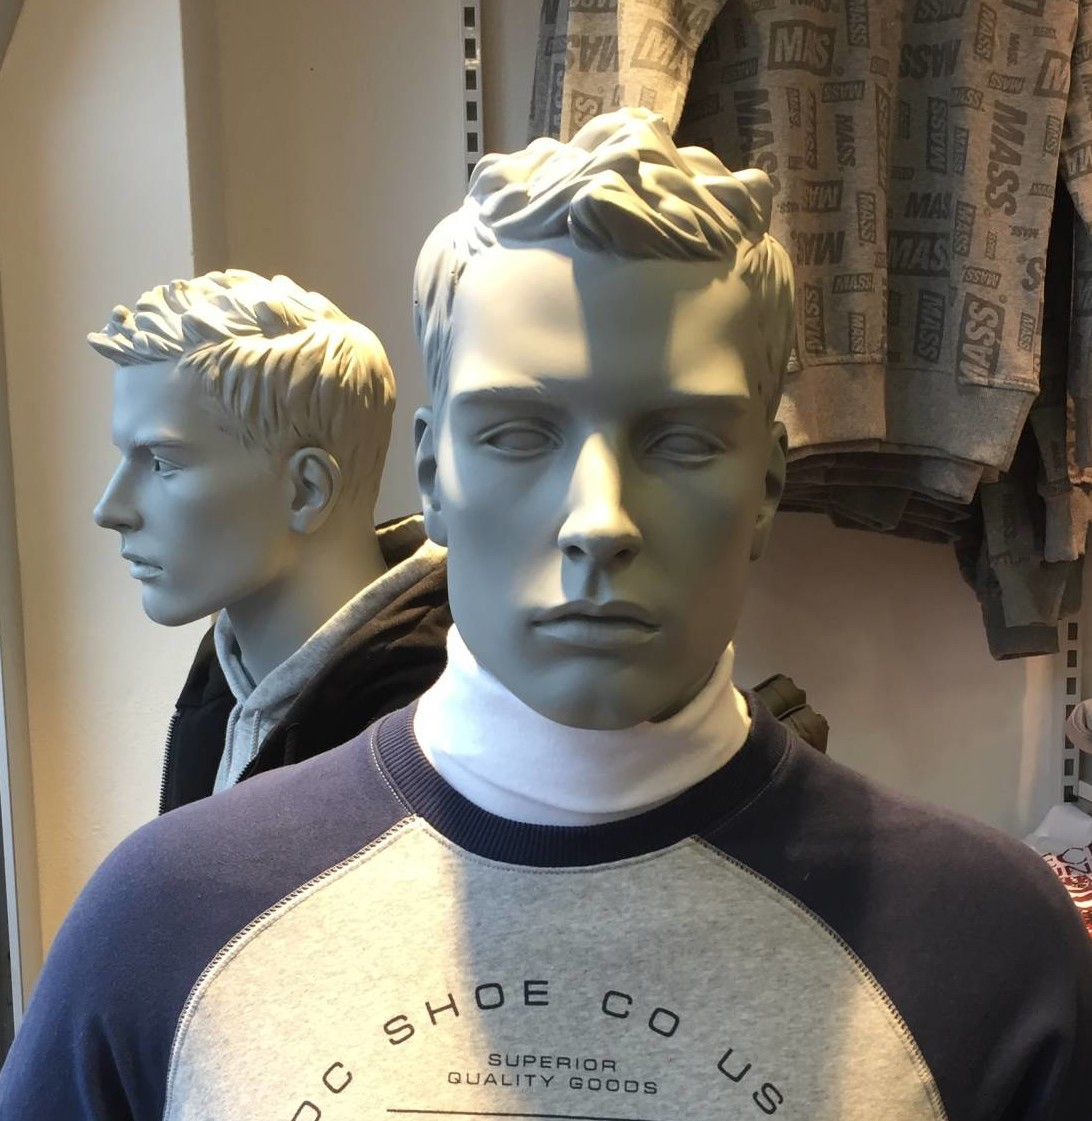 Herremannequinen Jason vist i en lækker grå farve